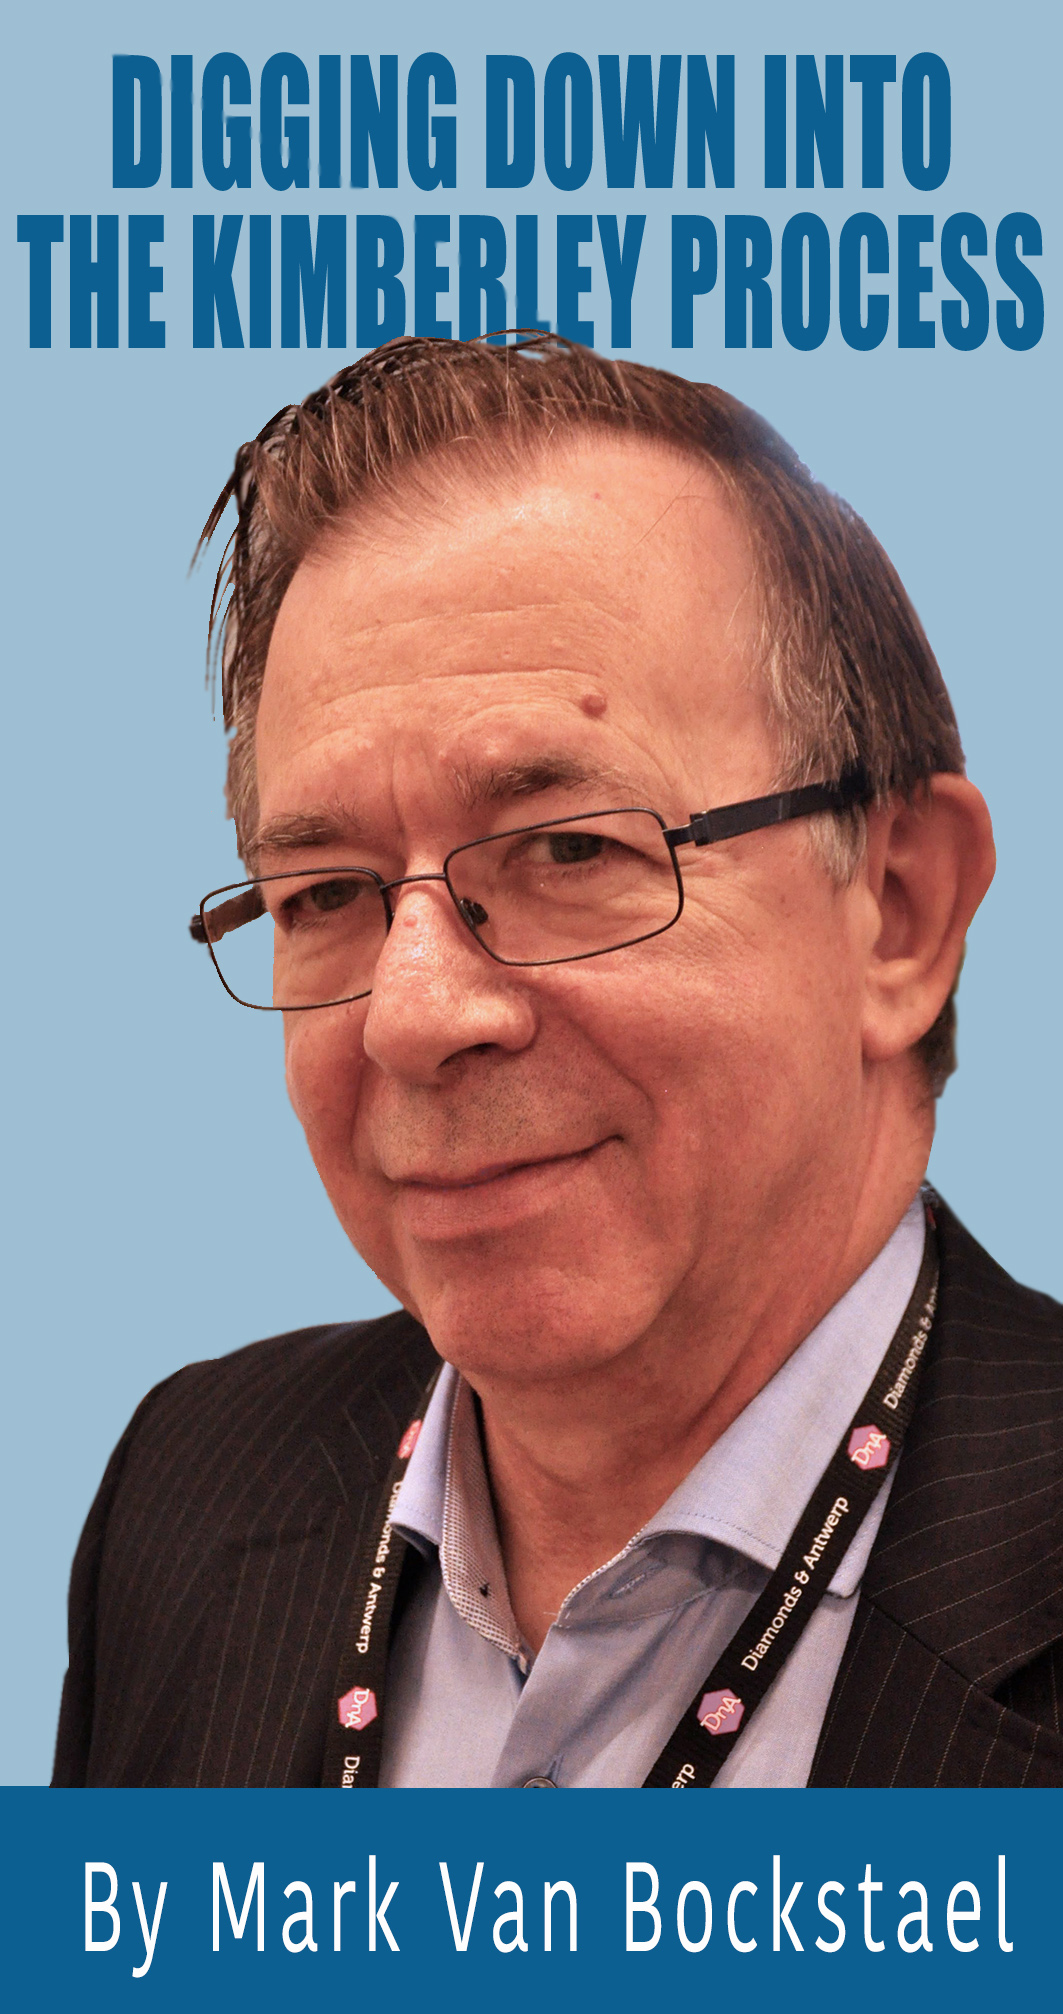 Digging Down into the Kimberley Process by Mark Van Bockstael